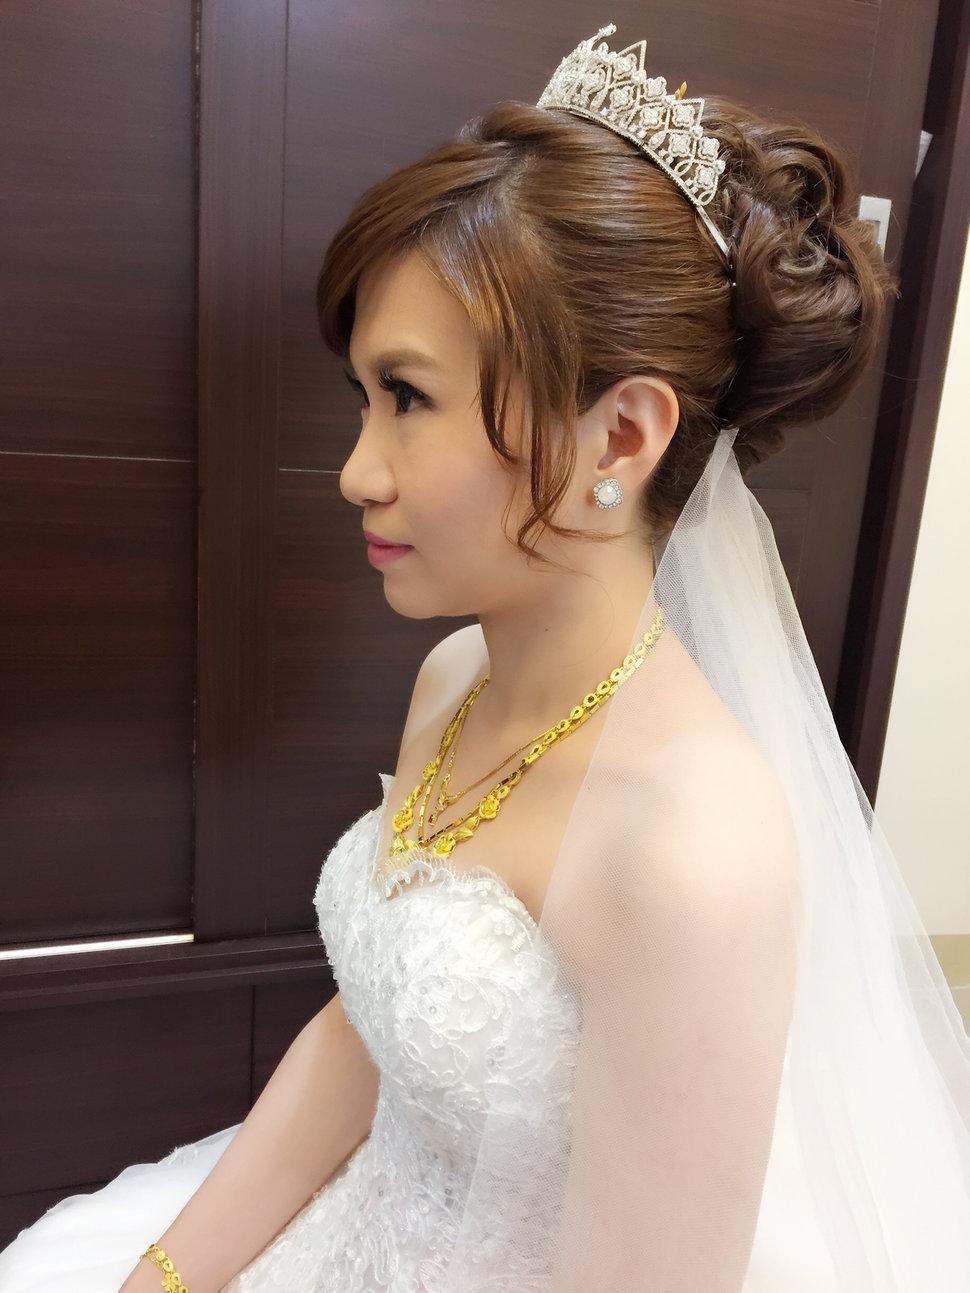 IMG_0340 - Jojo chen Makeup新娘秘書《結婚吧》